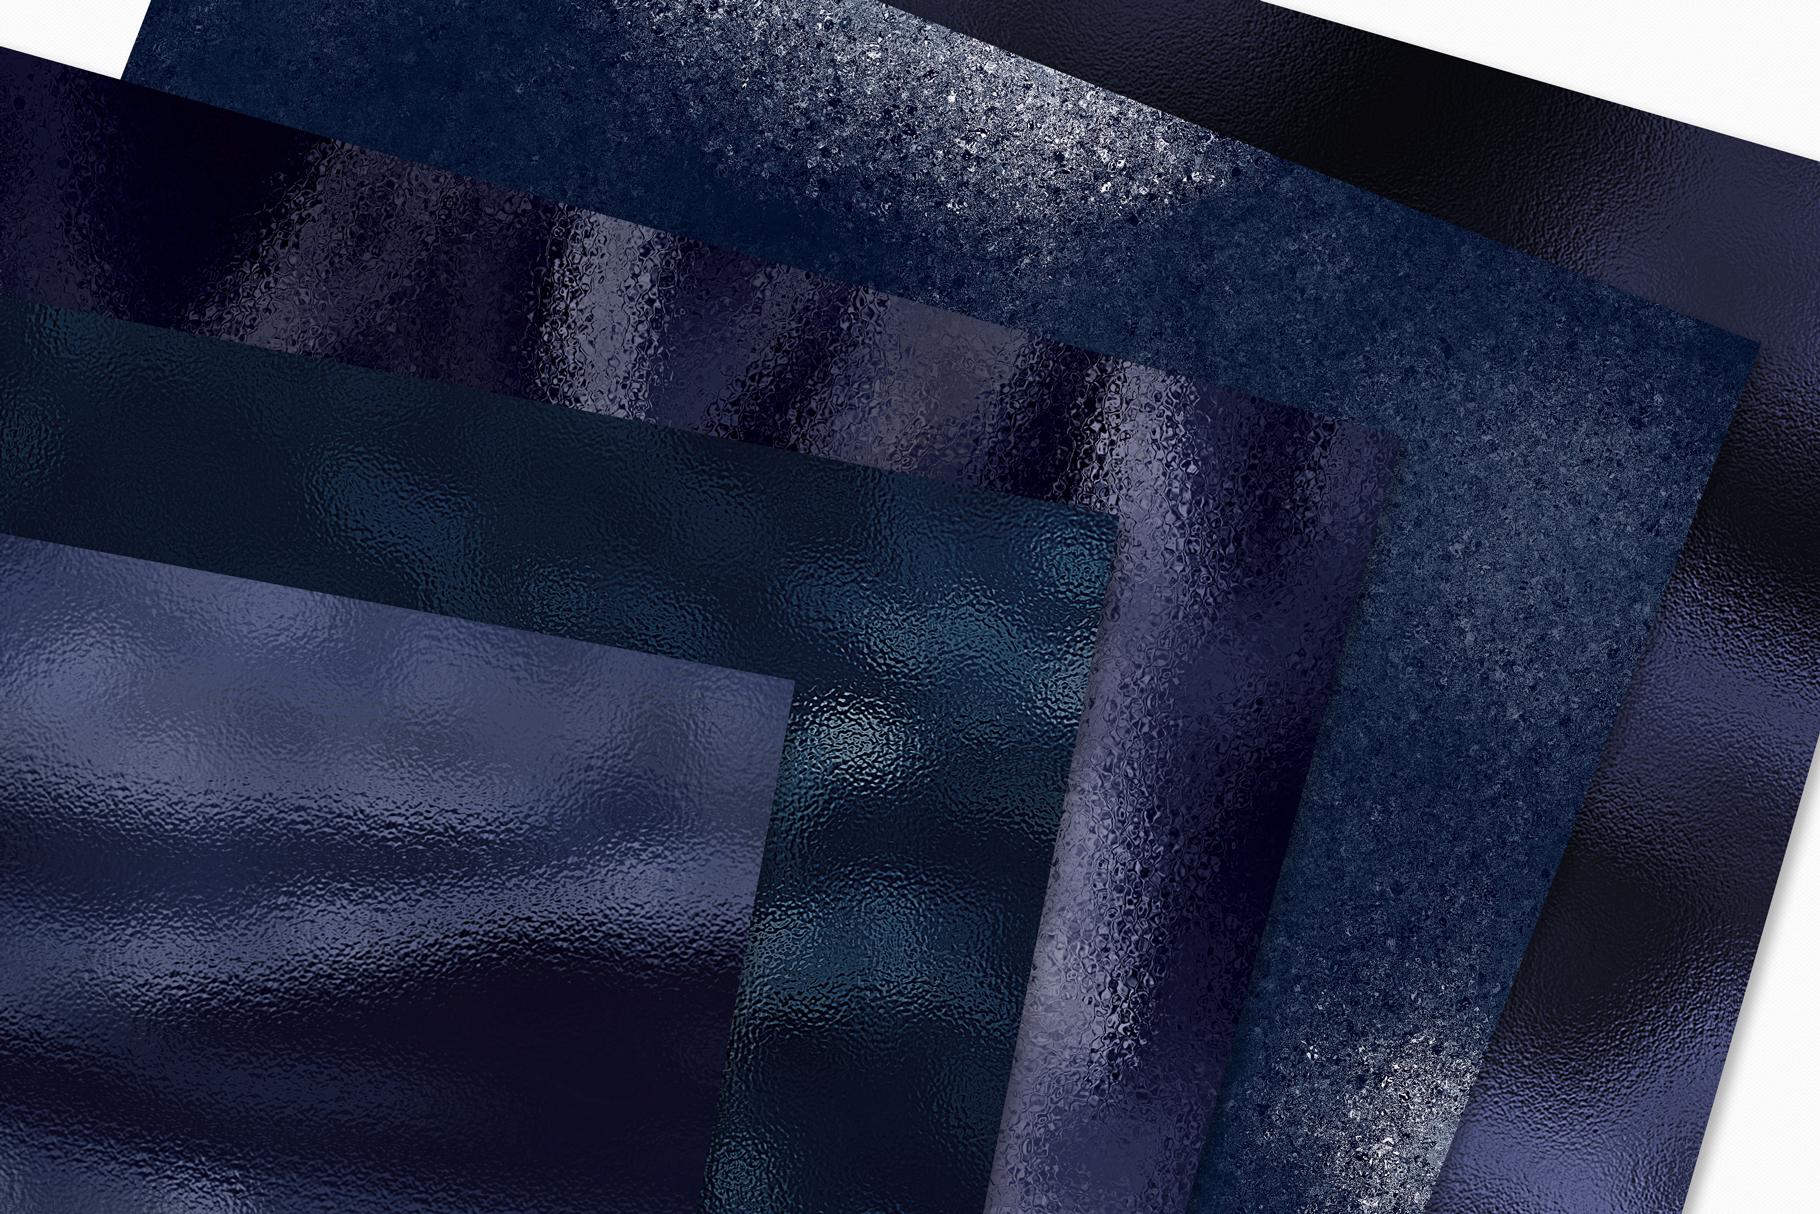 Dark Metallic Textures - 15 Foil & Glitter Digital Papers example image 2